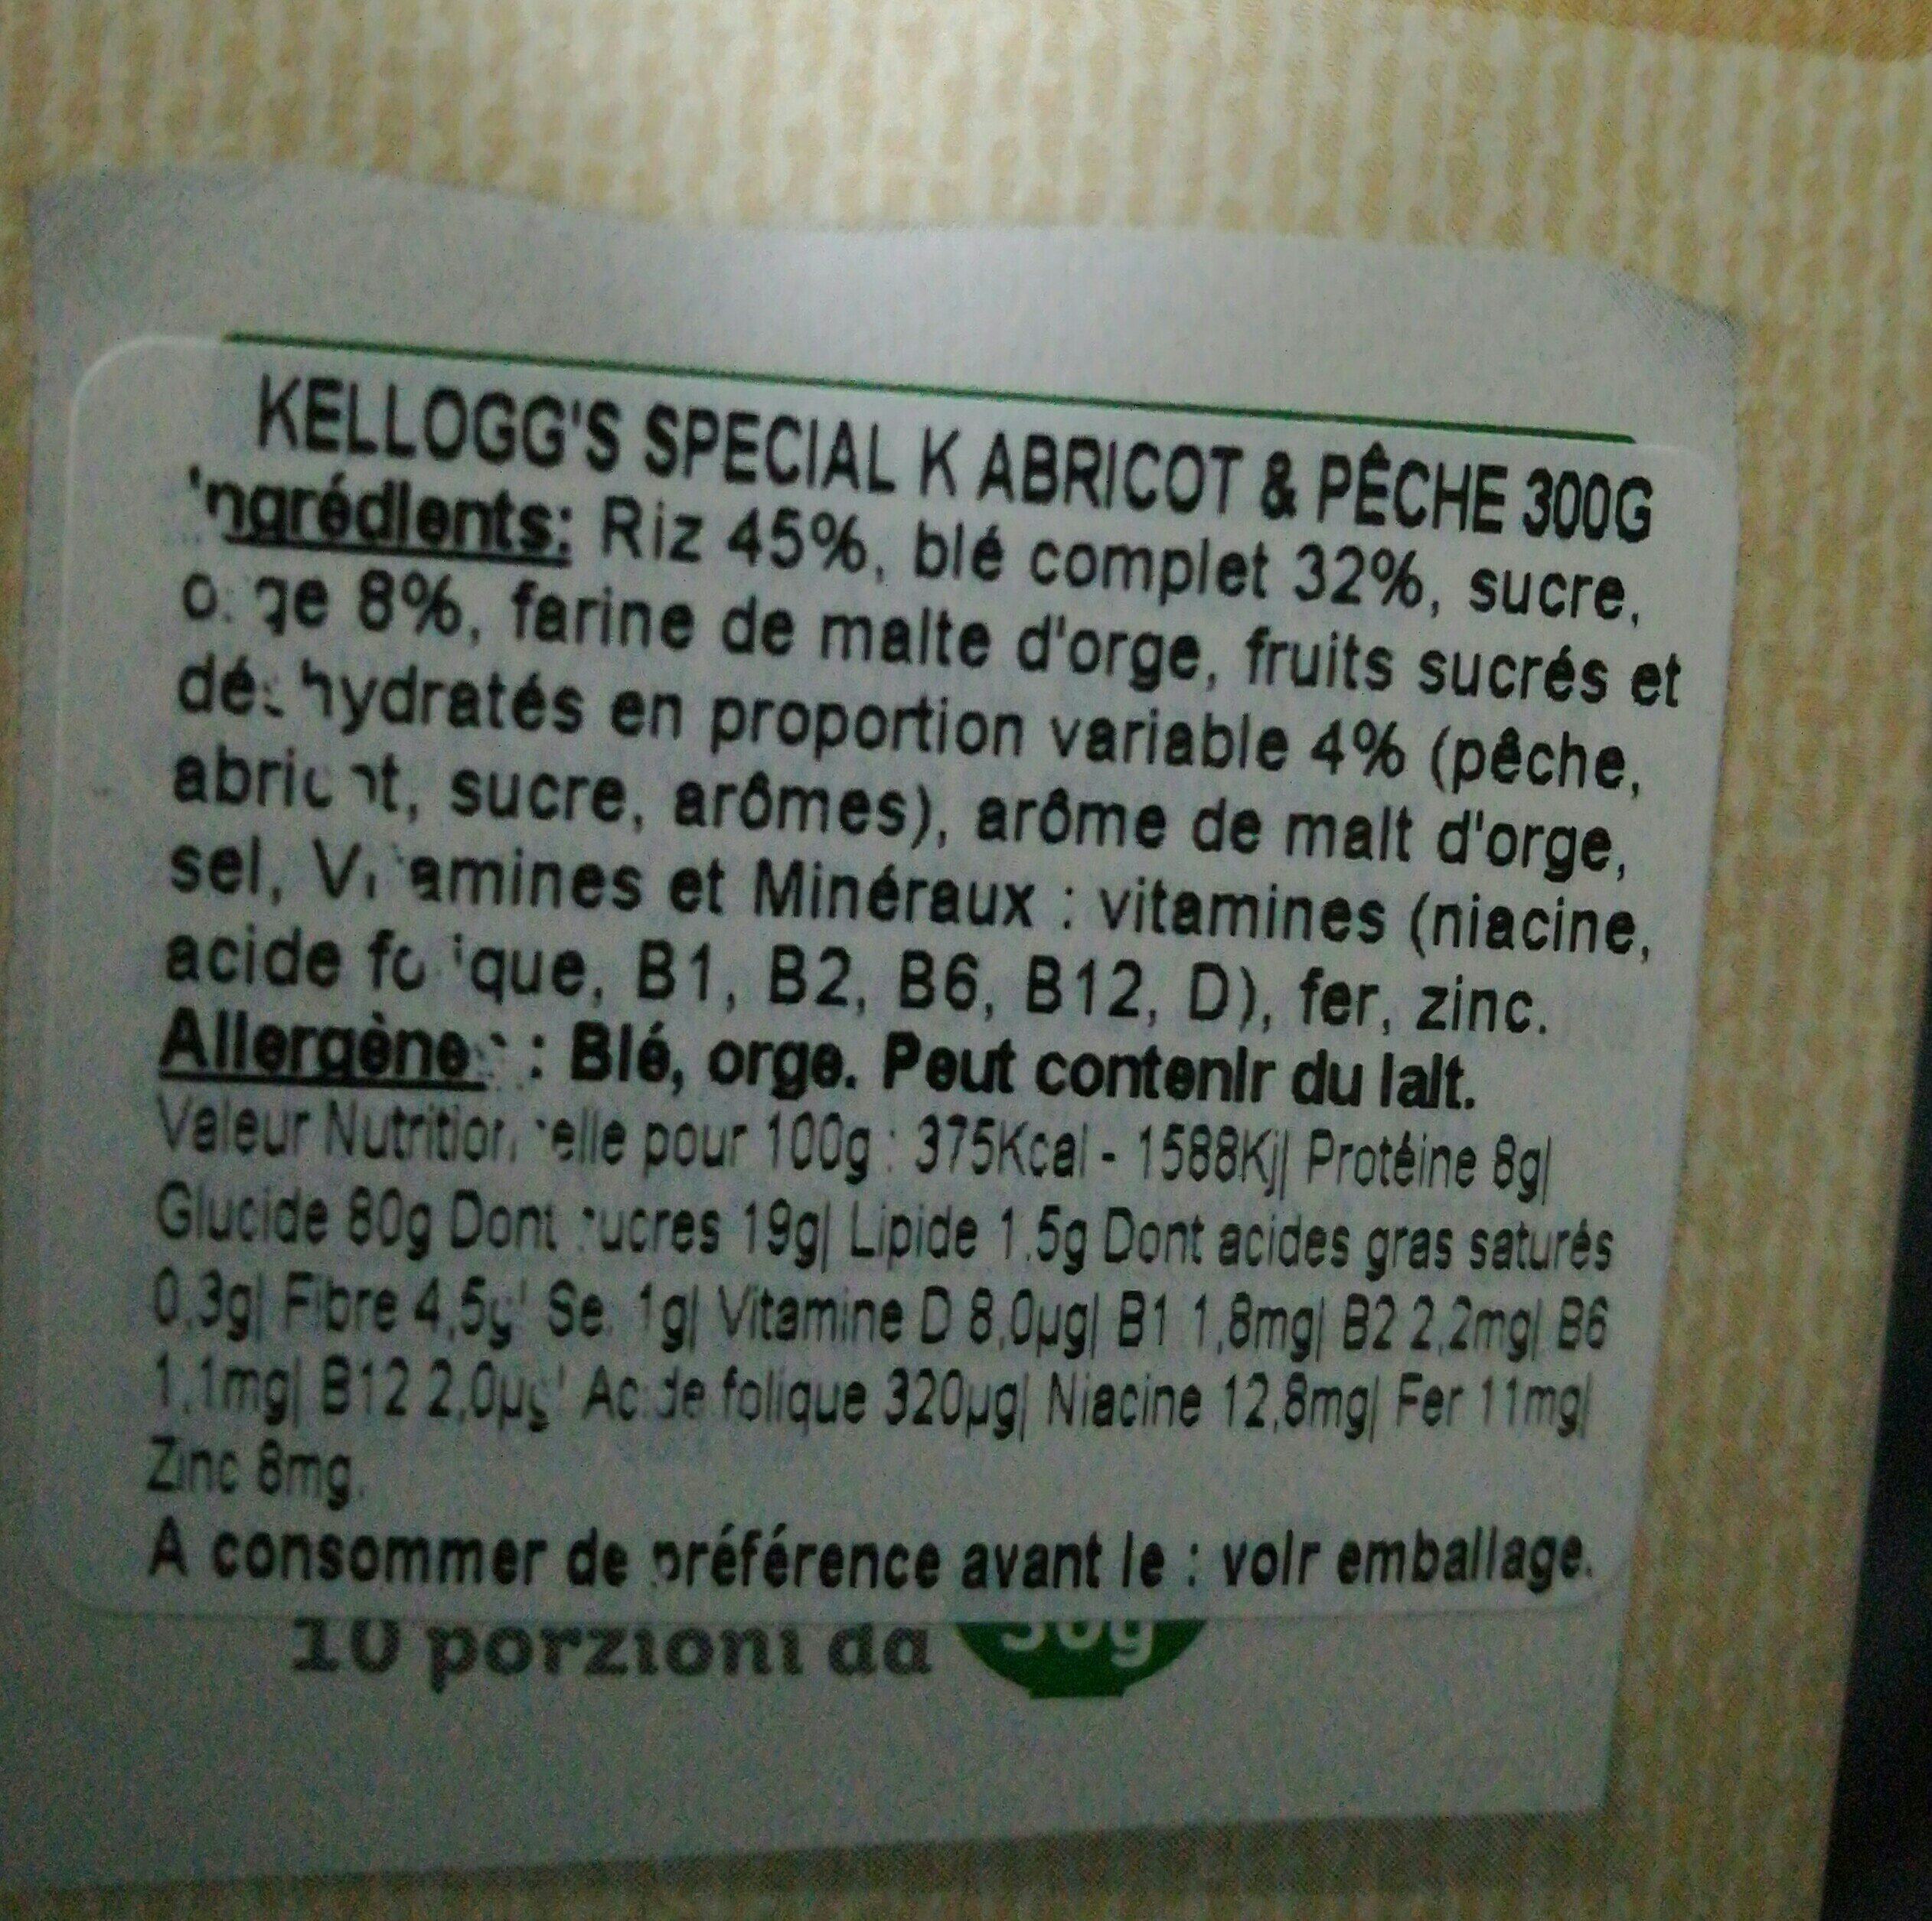 Kellogg's Special K Albic / Pesc. gr300 (e) - Ingredients